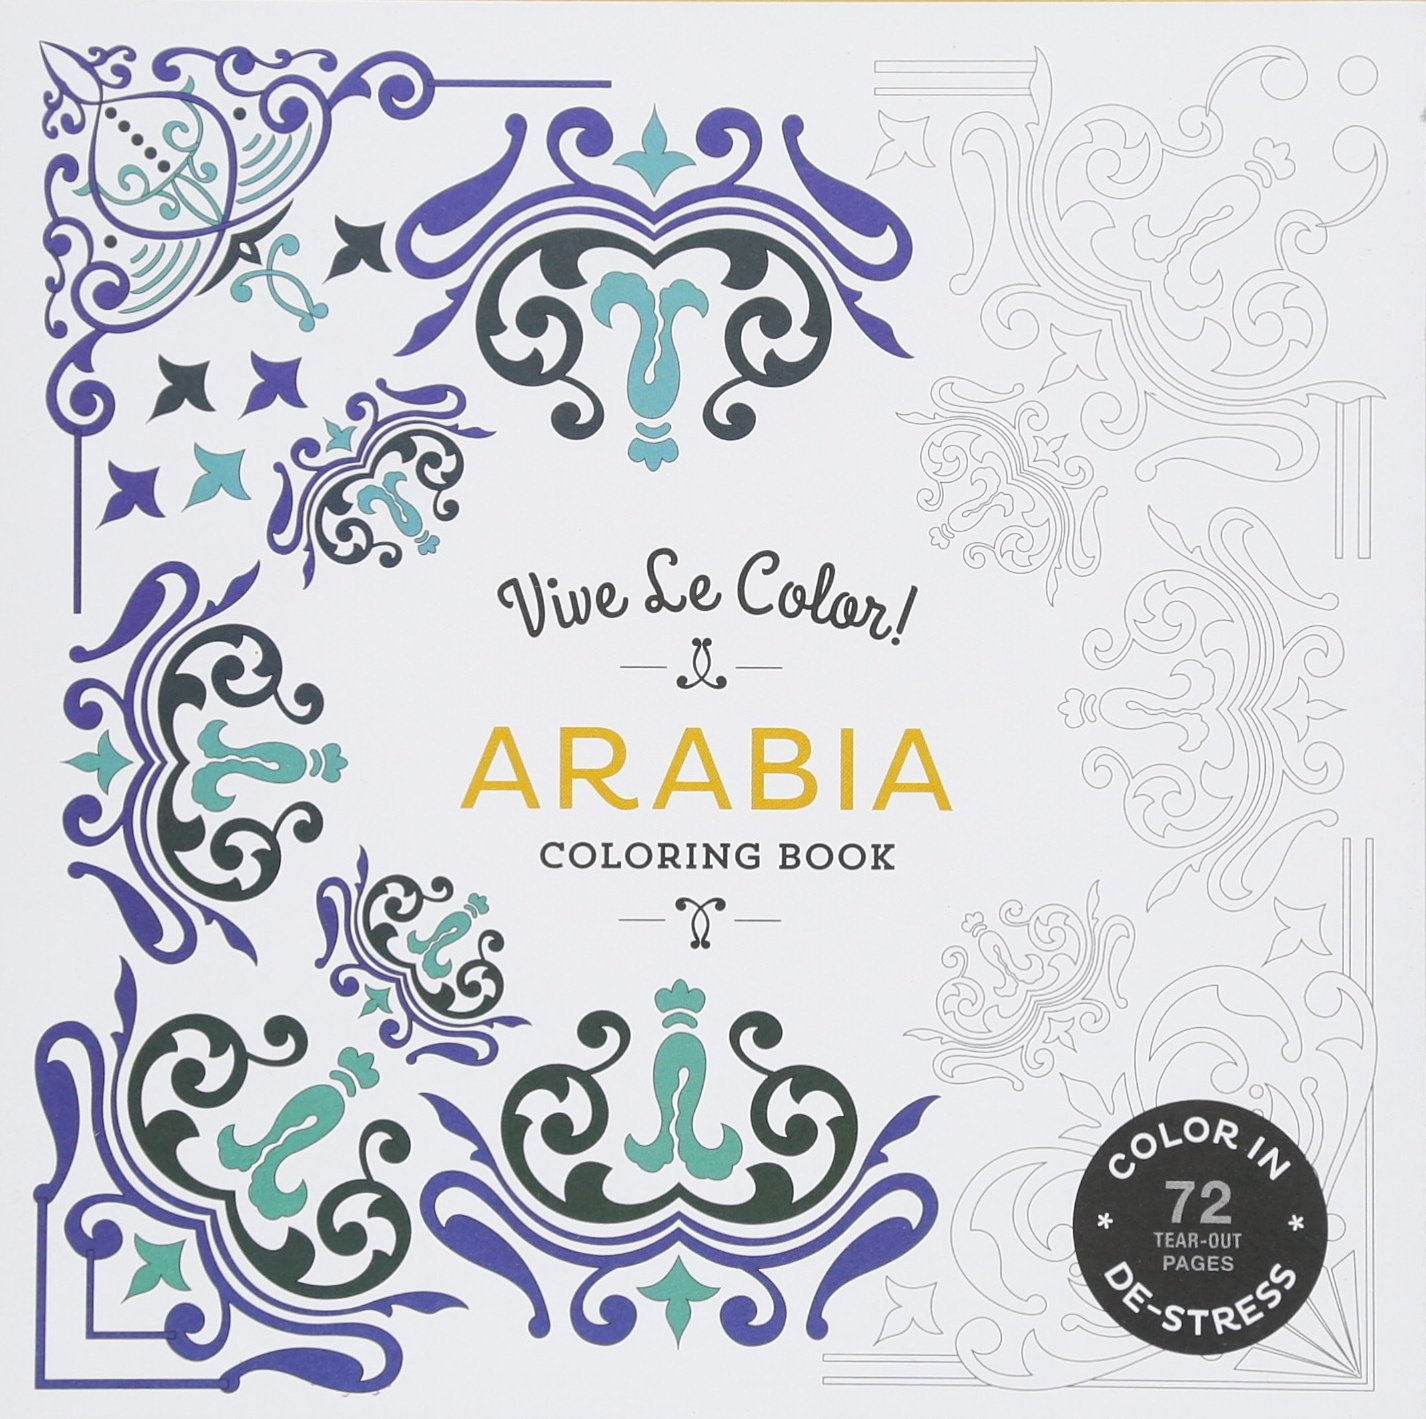 Download Vive Le Color! Arabia (Adult Coloring Book): Color In; De-stress (72 Tear-out Pages) ebook